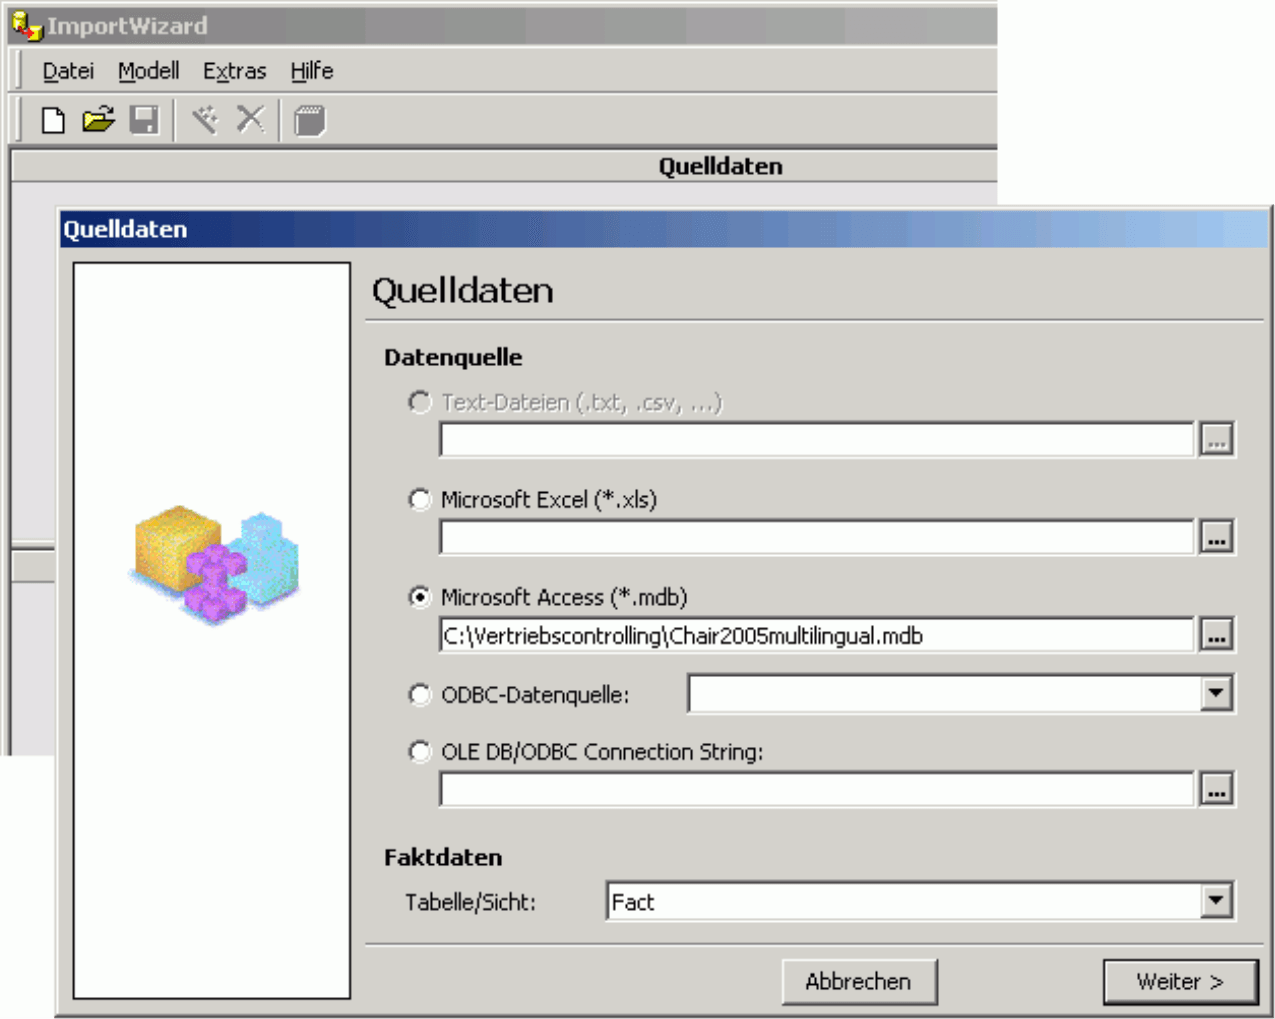 Selektion des Datenbanktyp im Fenster Quelldaten (Microsoft Excel, Microsoft Access, ODBC-Datenquelle, OLE DB/ODBC Connection String)